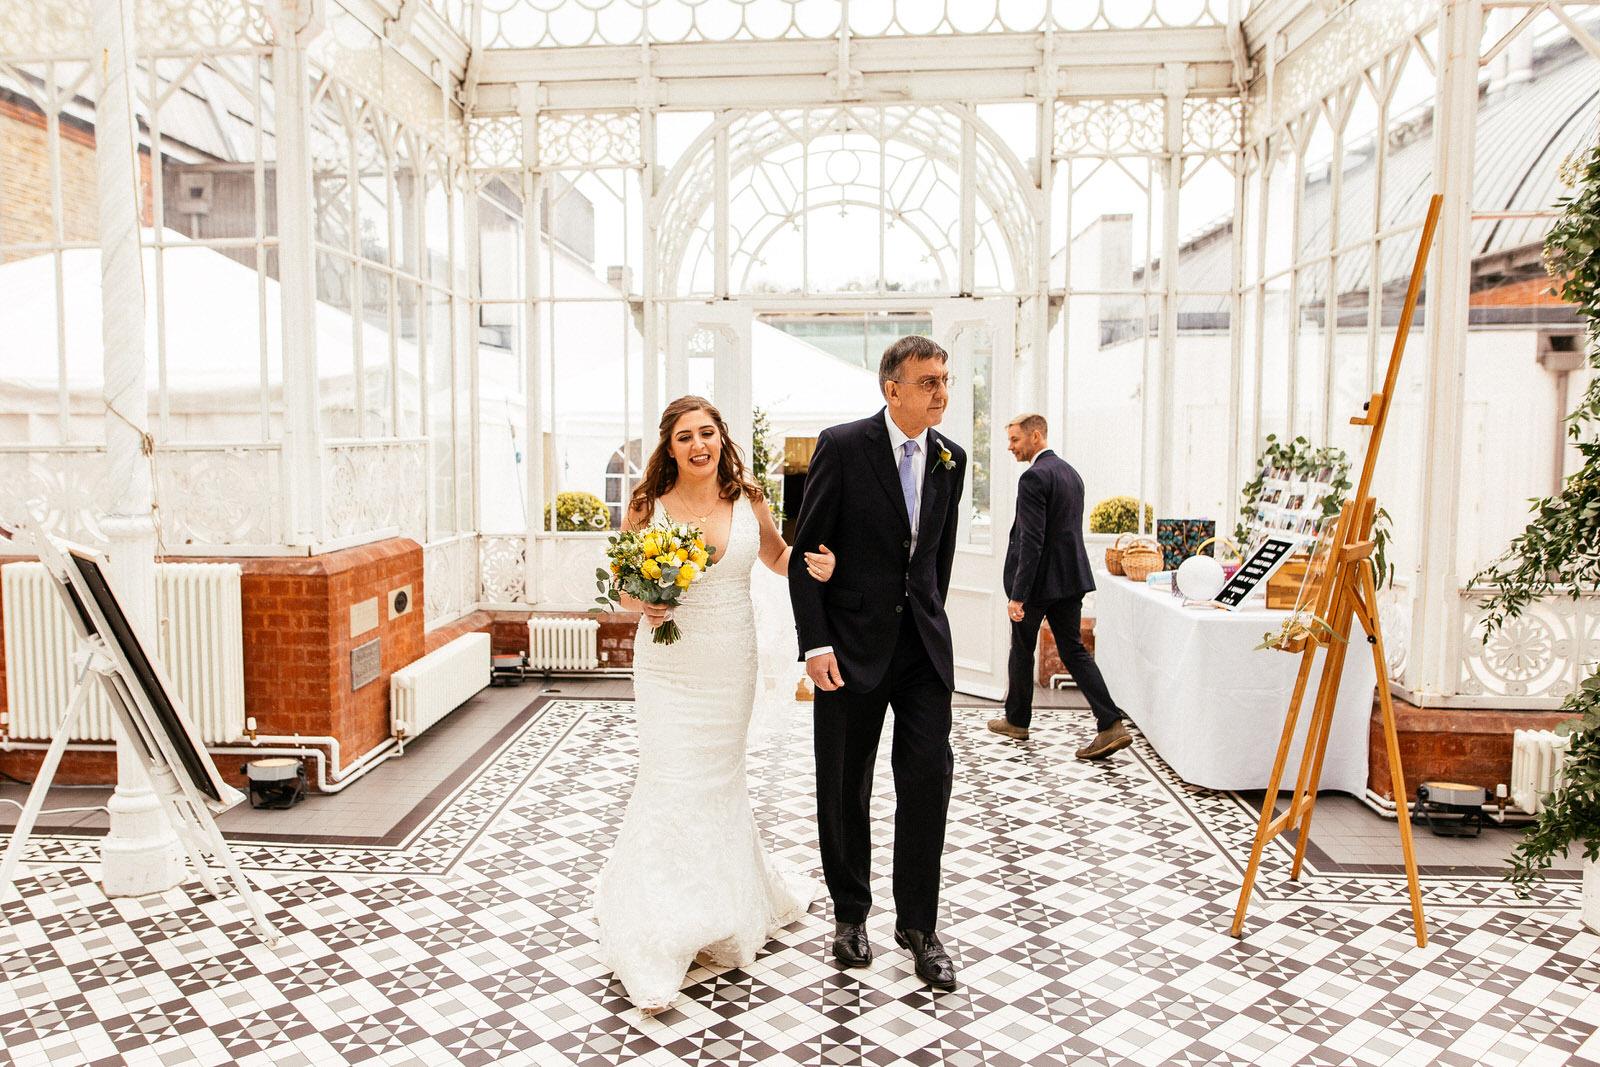 Jenni-and-James-Wedding-Highlights-8.jpg